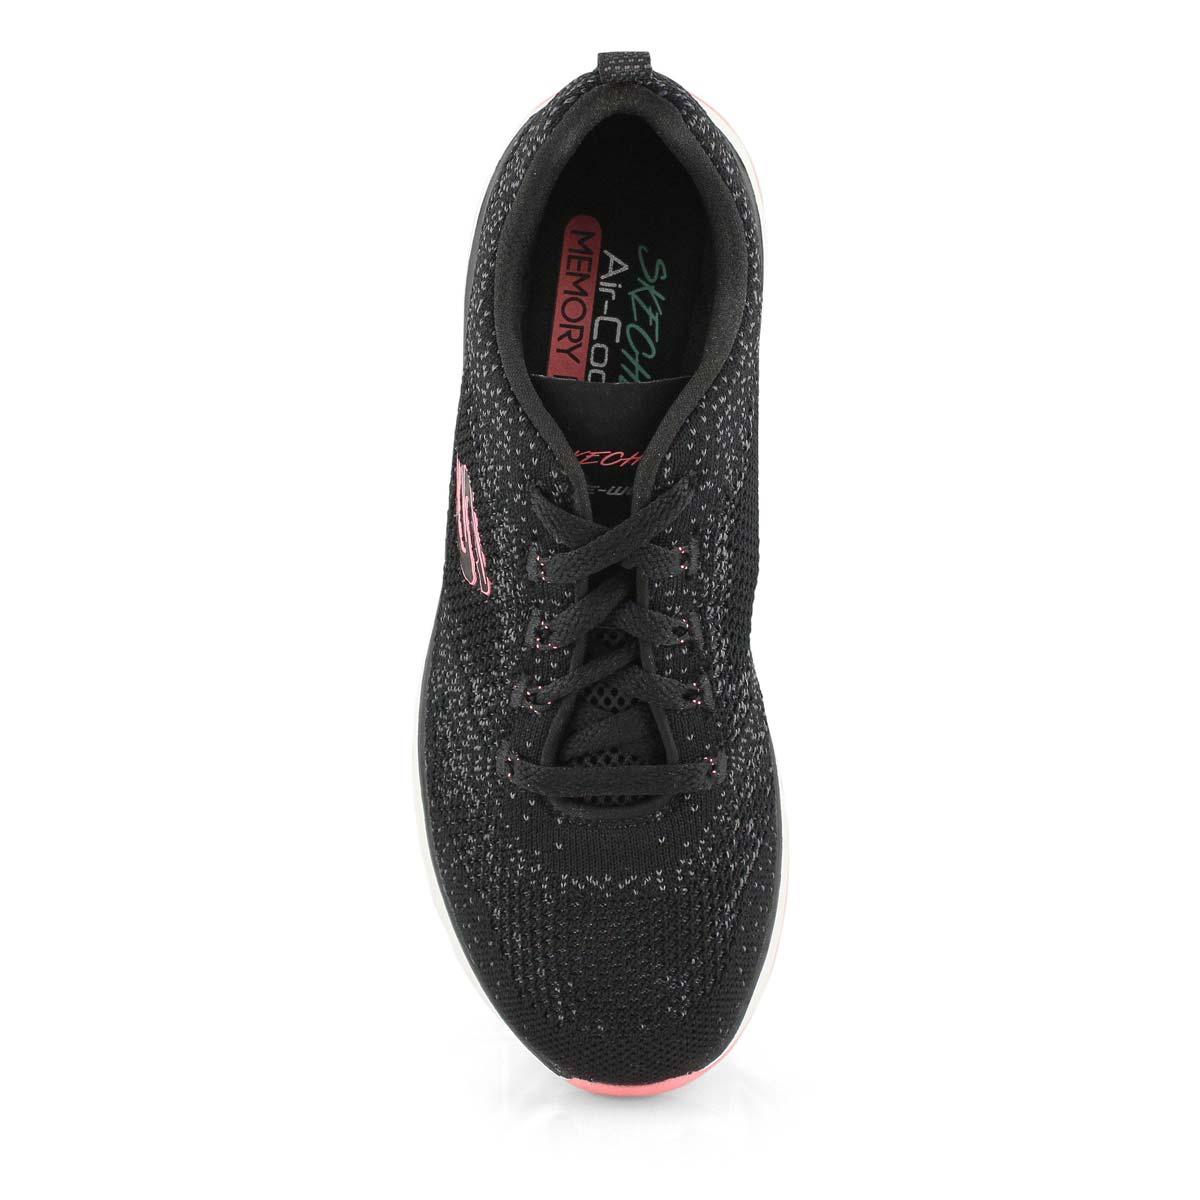 Lds Ultra Groove blk/pnk sneaker